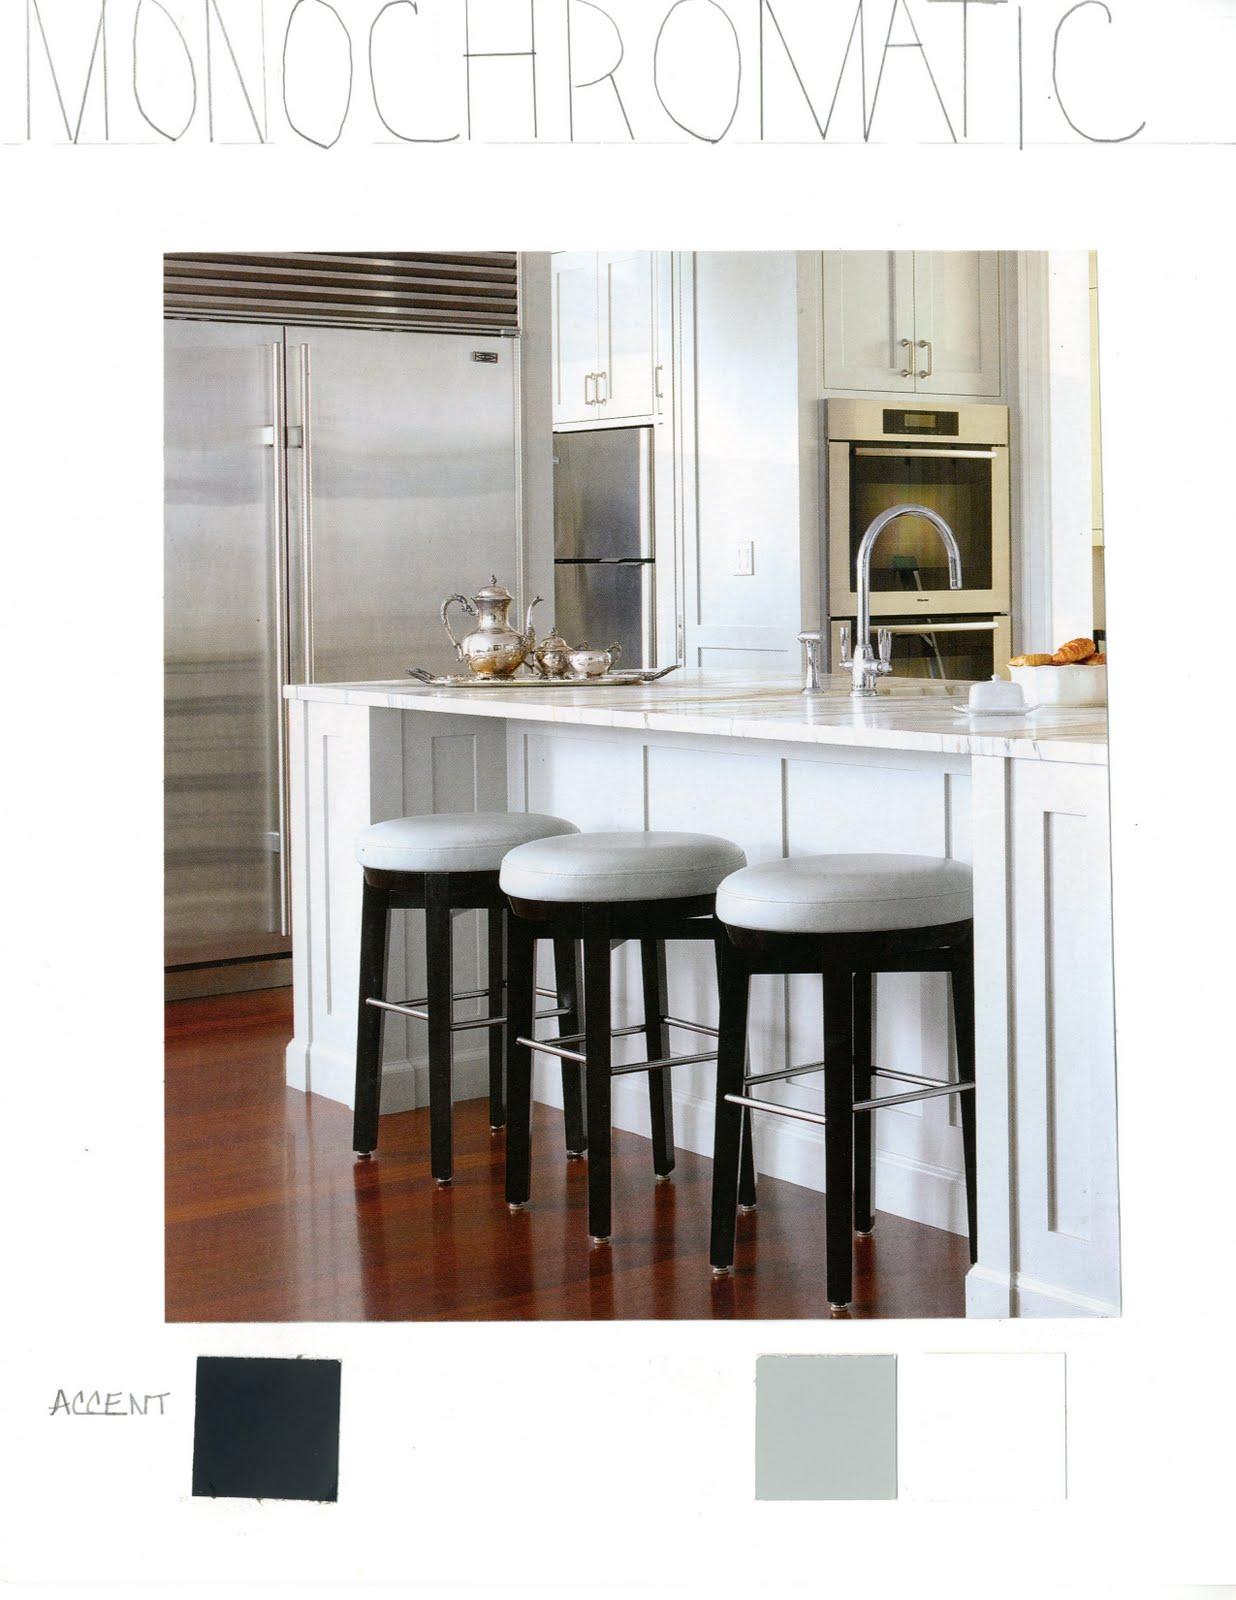 Wsu interior design with janine color harmony - Harmony in interior design ...